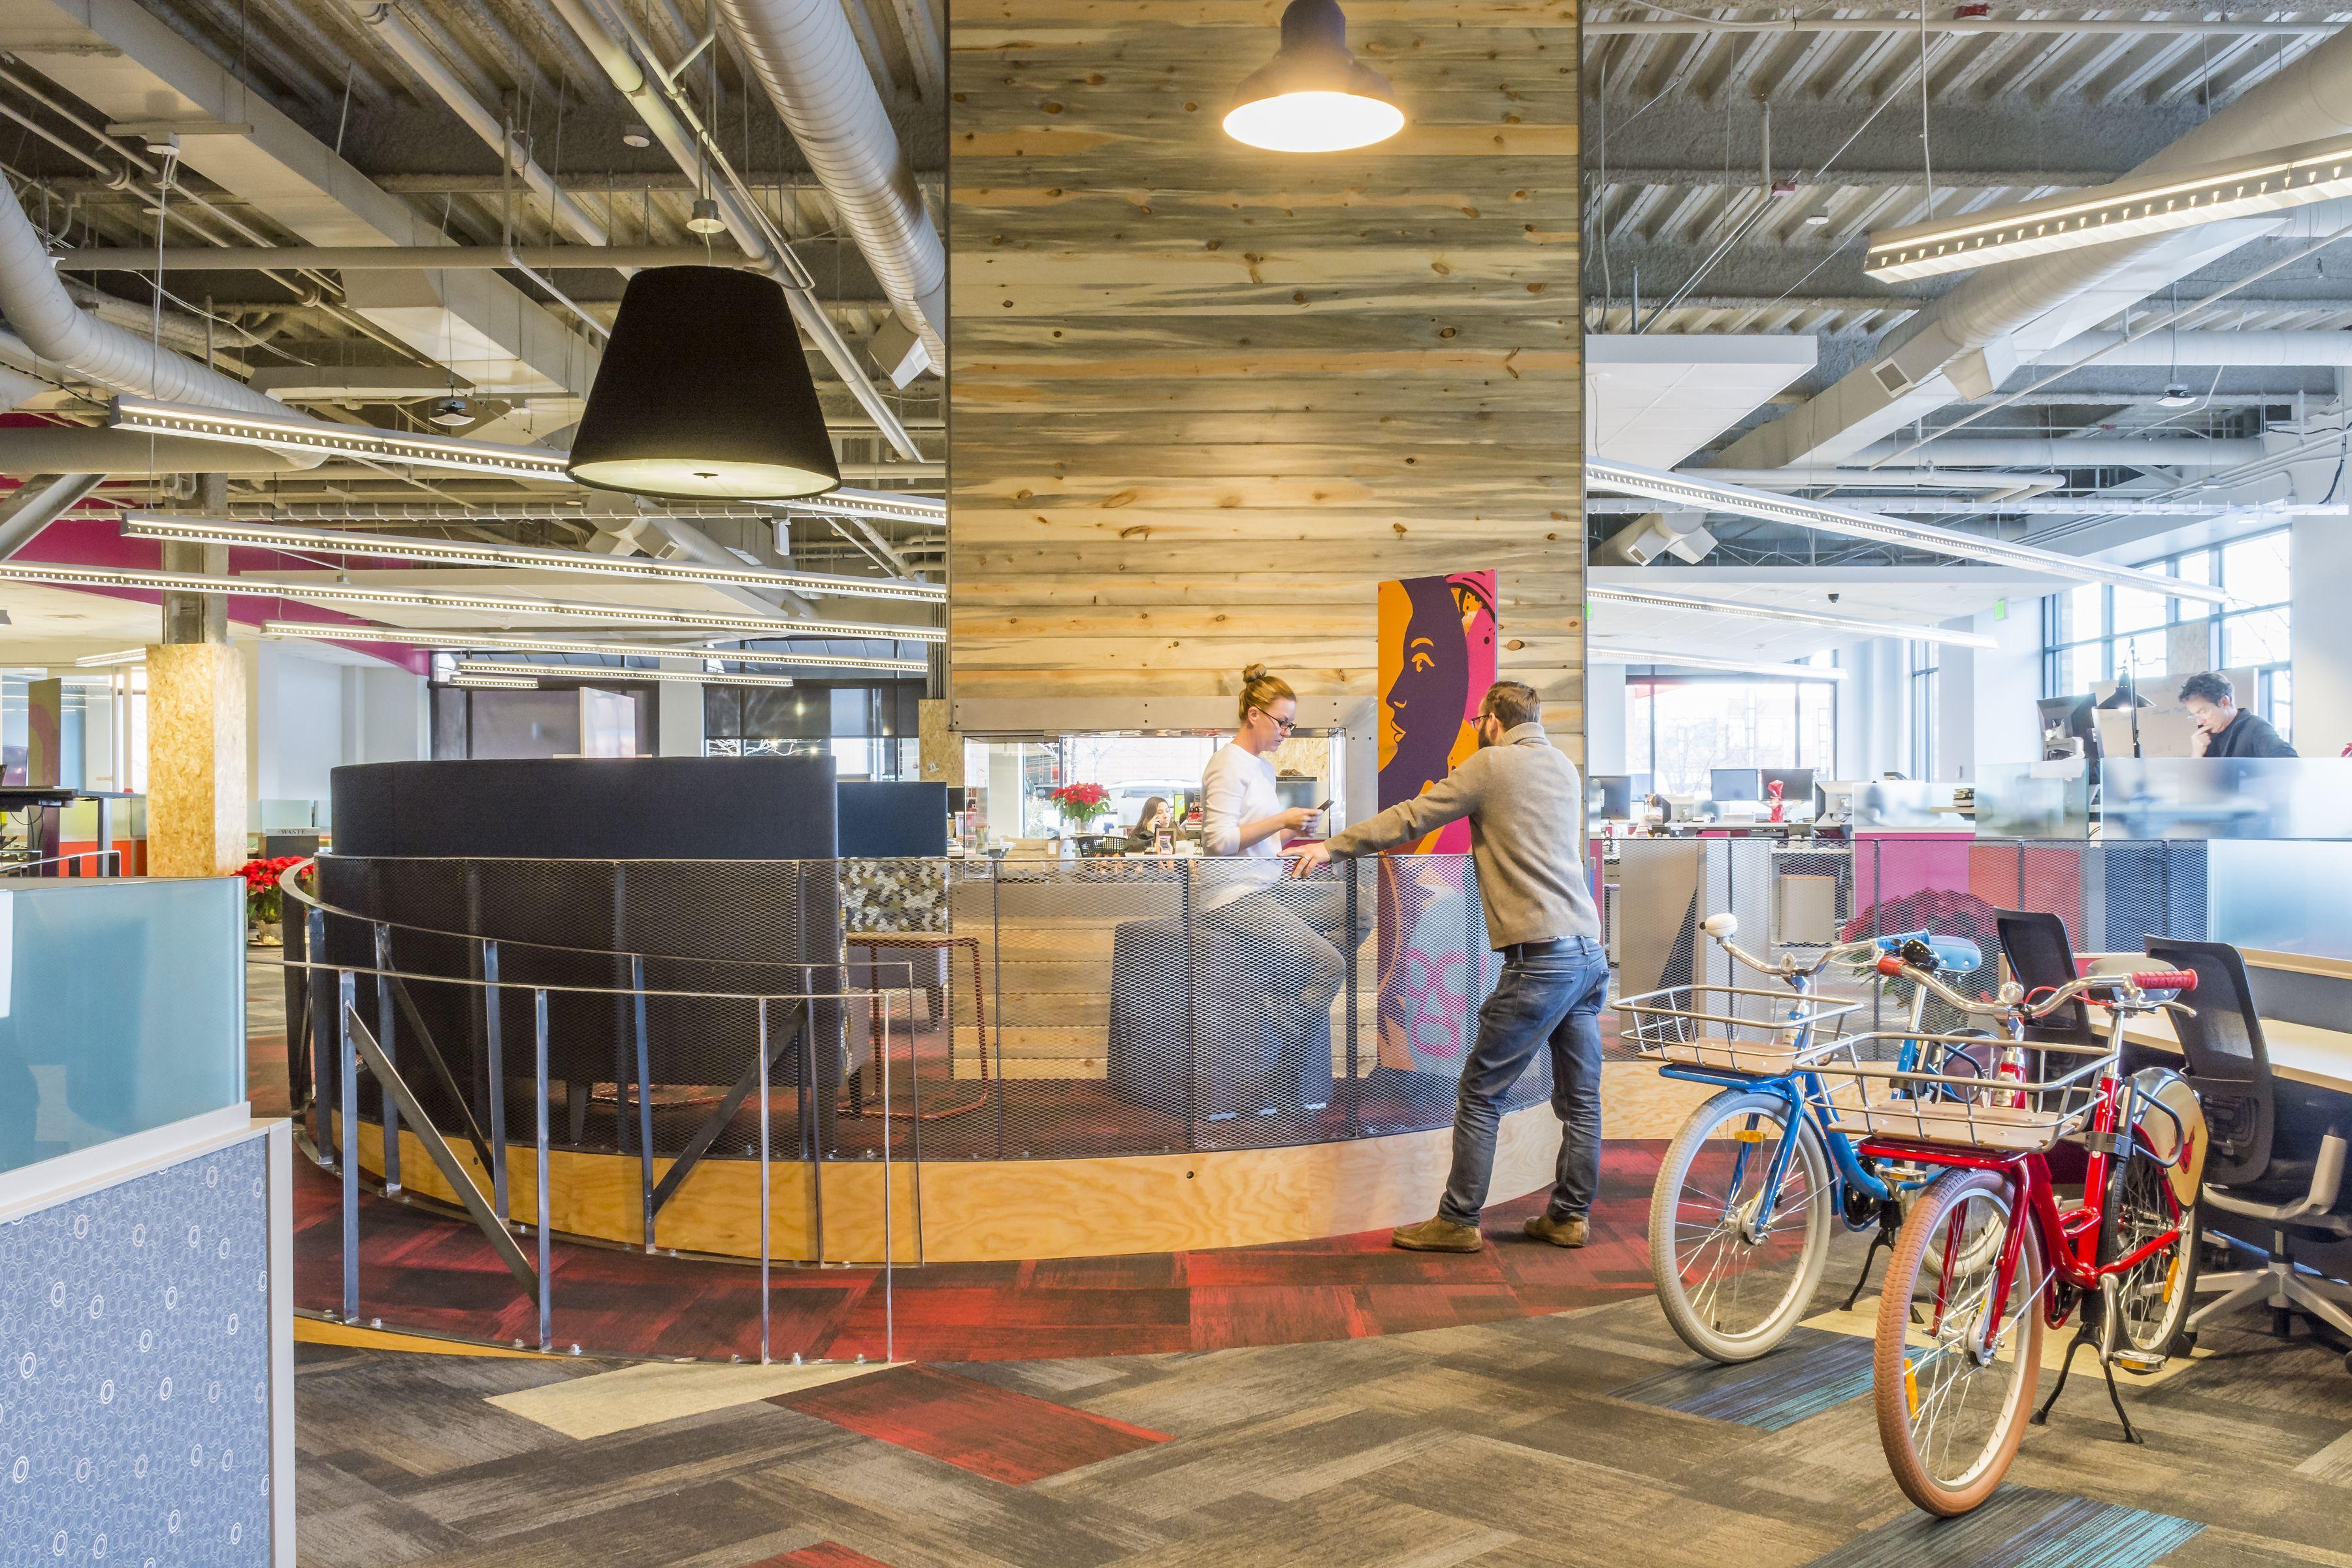 pin interior tenant denver coplan headquarters design hord macht improvement qdoba architecture designer